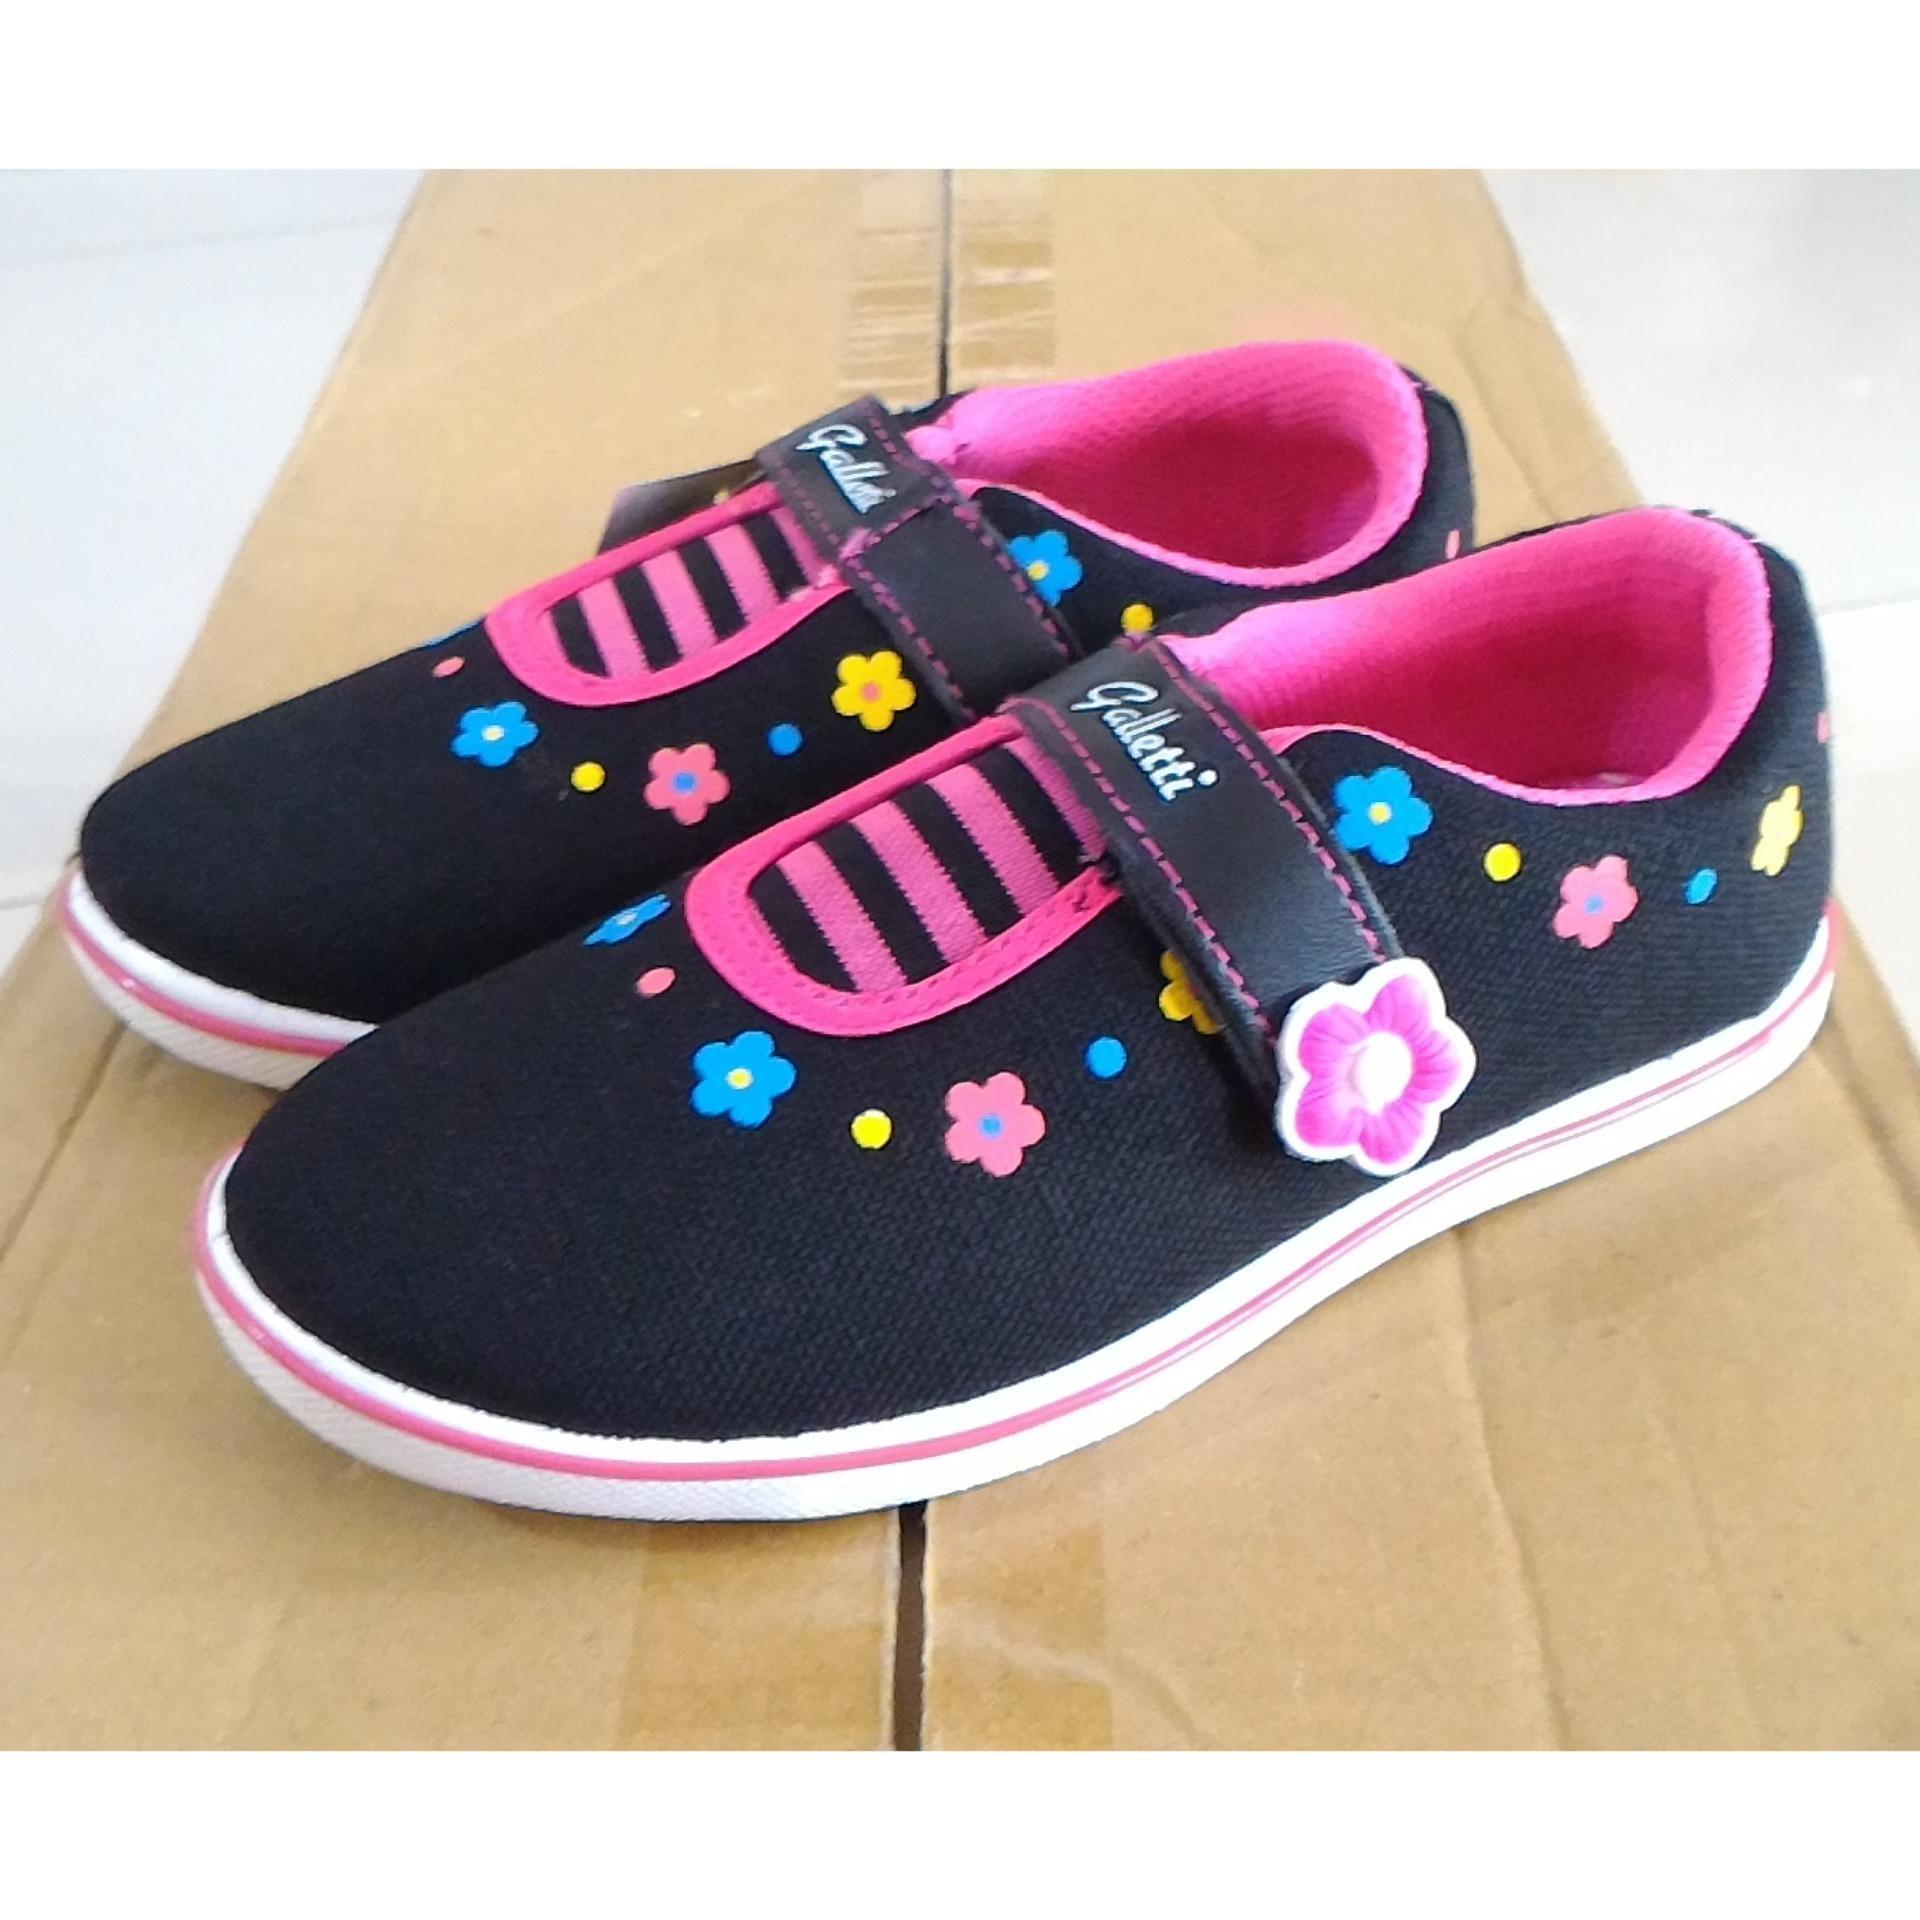 Spesifikasi Fanie Shoes Galletti Sepatu Sekolah Hitam Anak Perempuan Cantik Murah Fashion